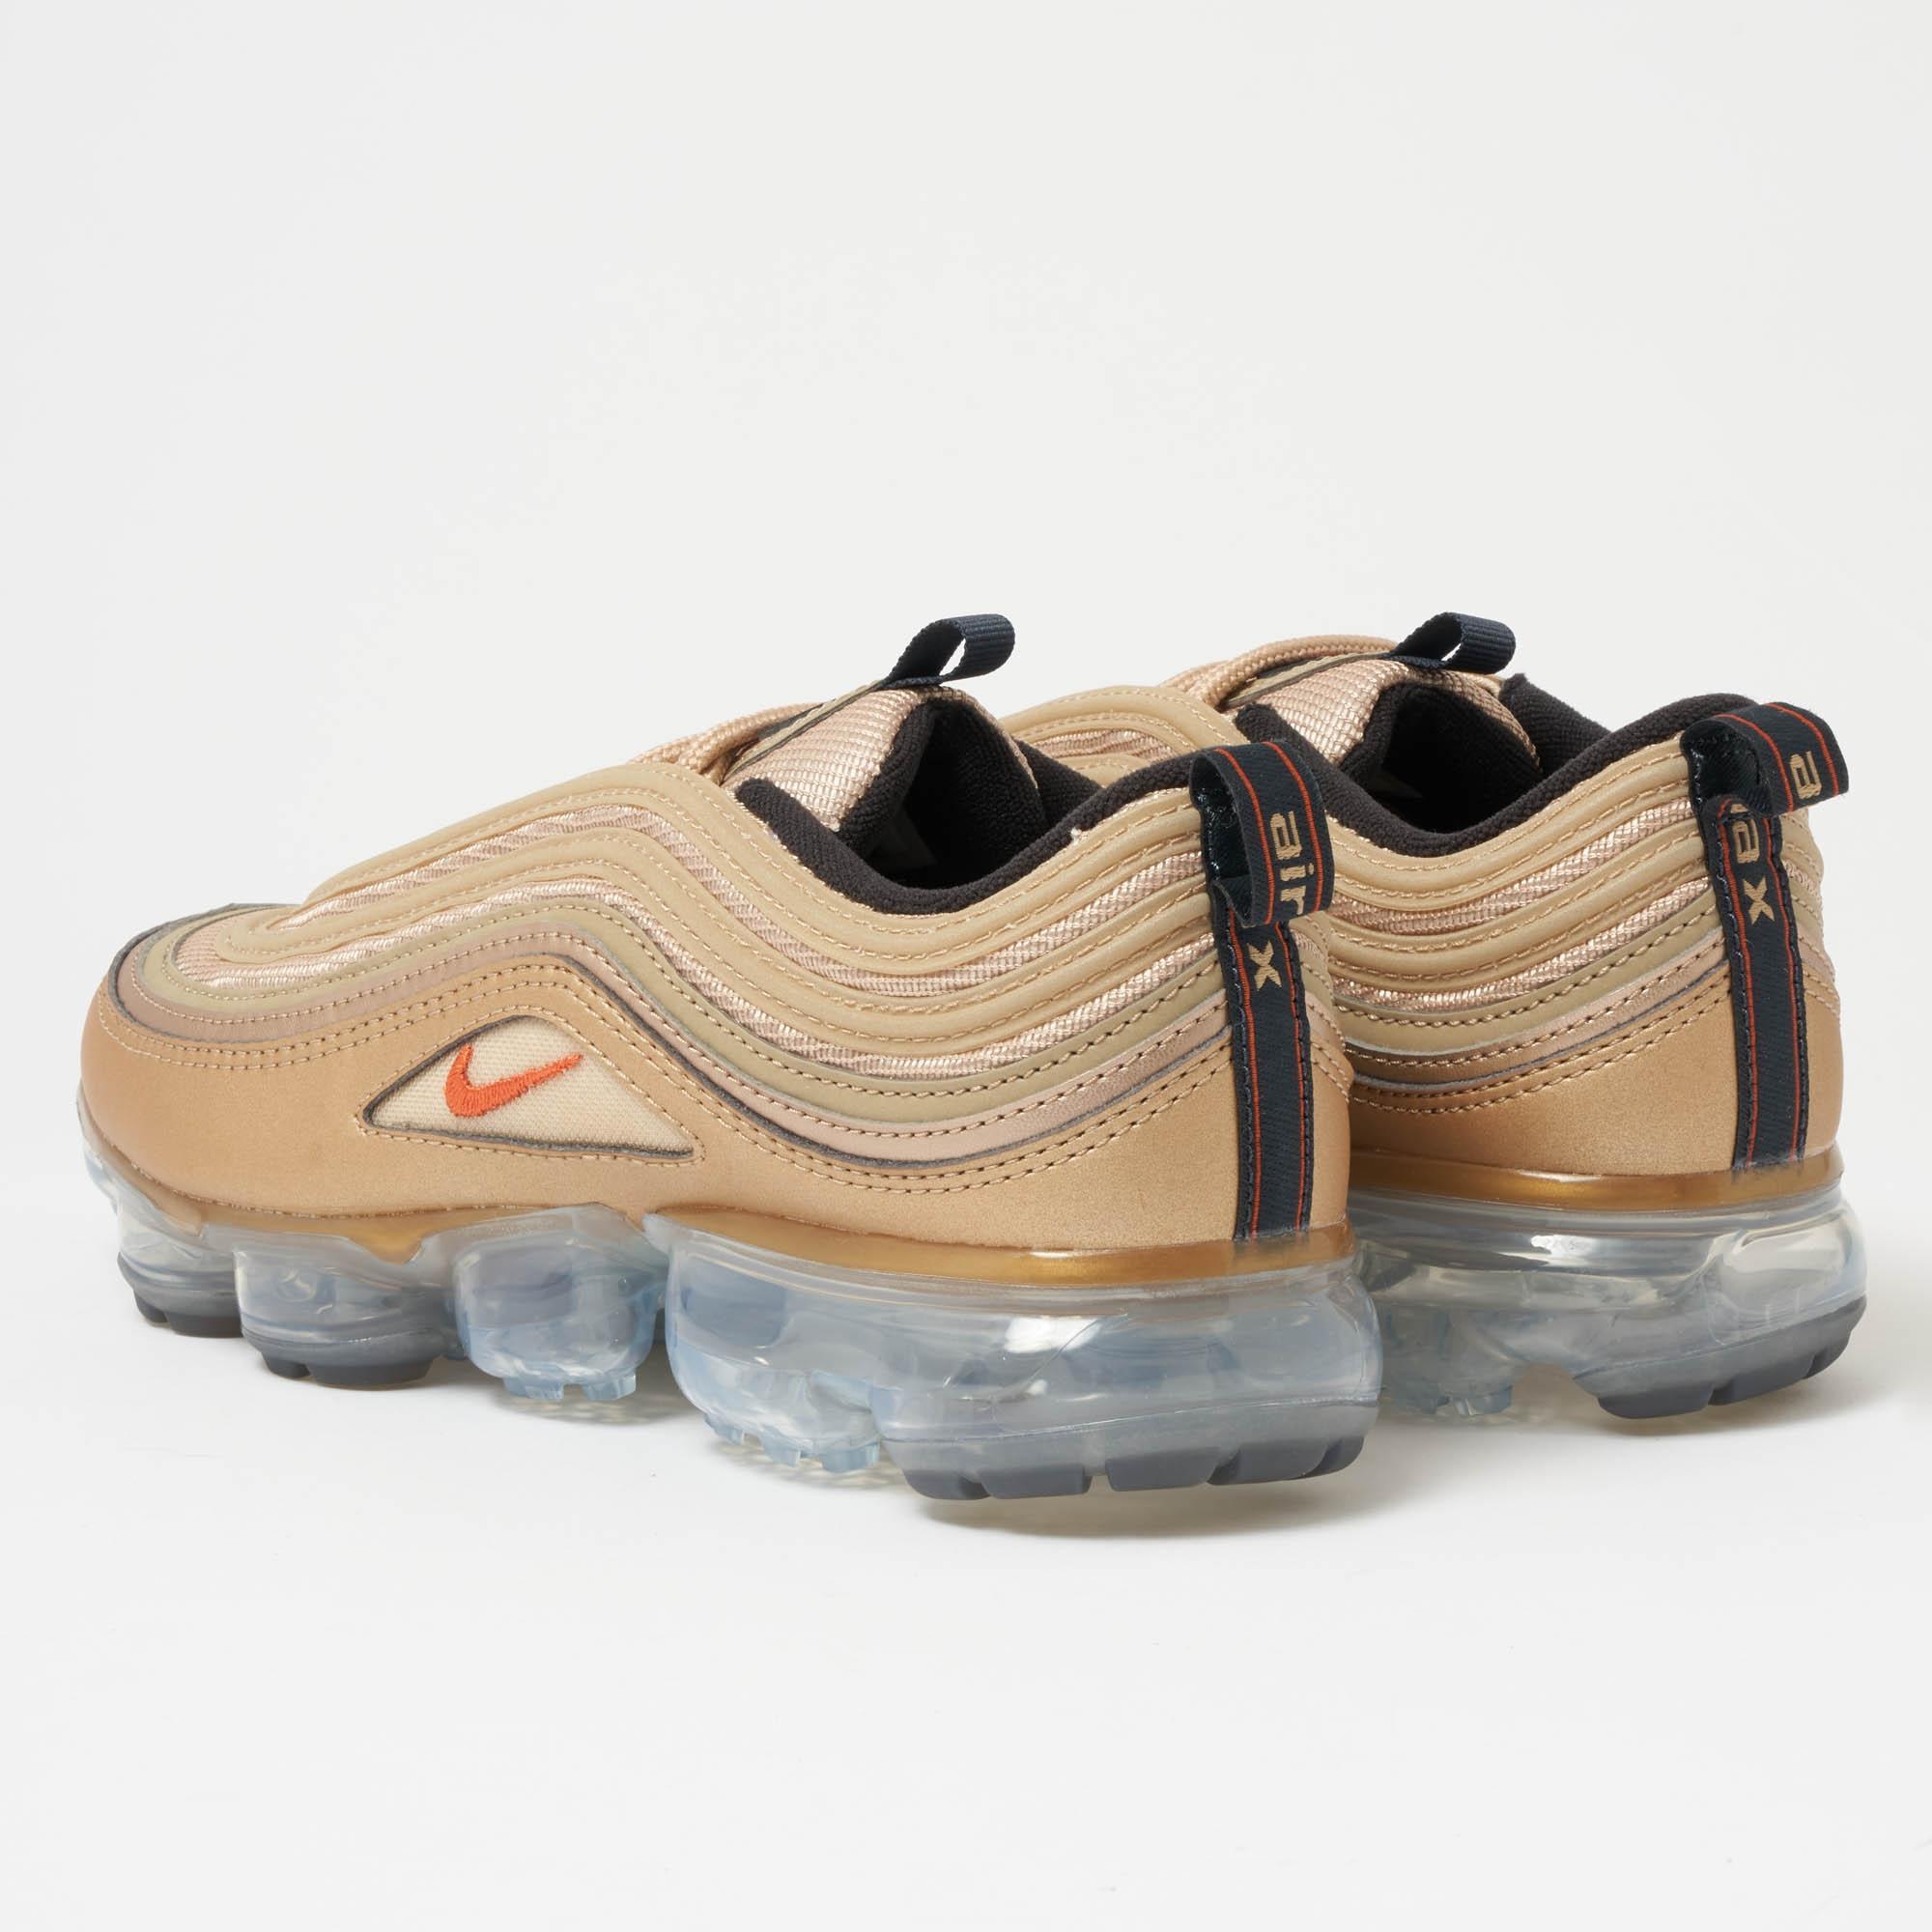 Lyst - Nike Air Vapormax 97 - Blur 5d555d2be